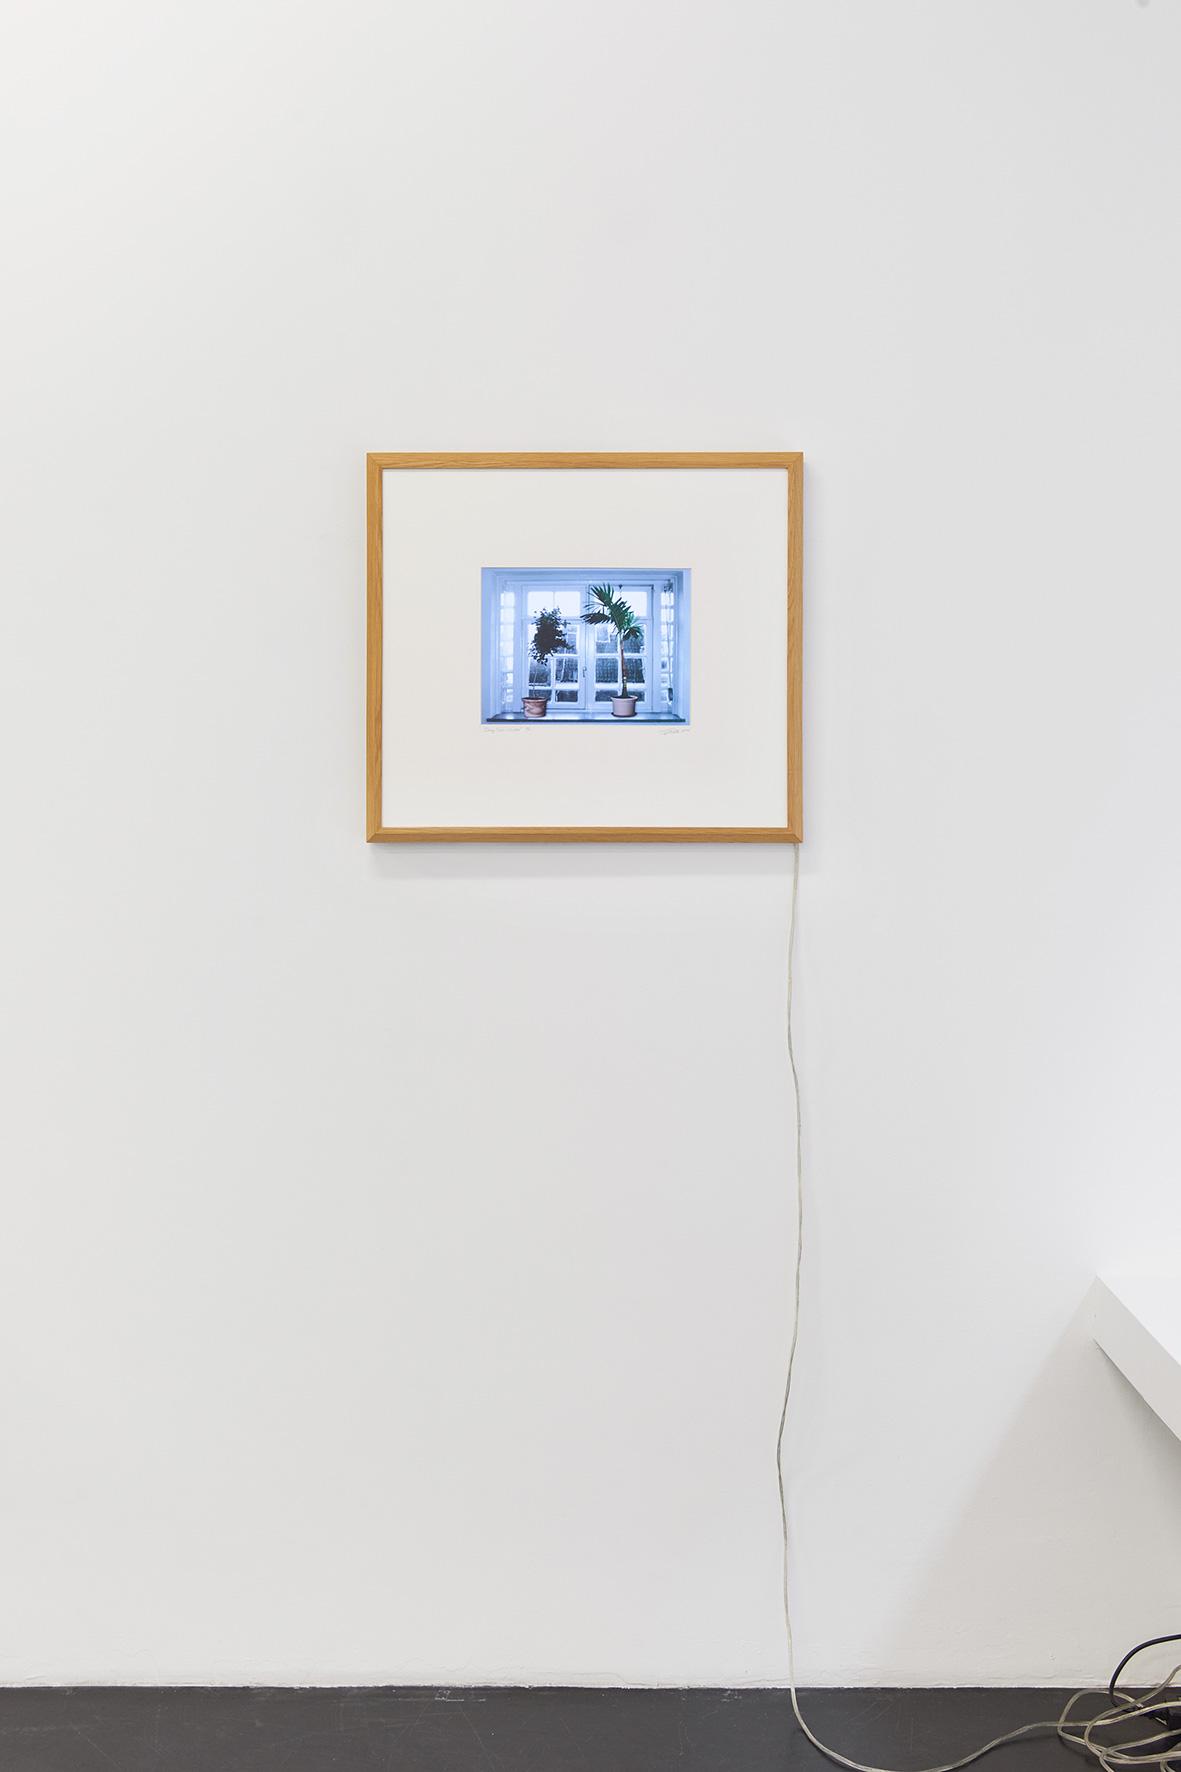 Ger van Elk_Talkin Trees-Window_2004_Markus Luettgen Gallery